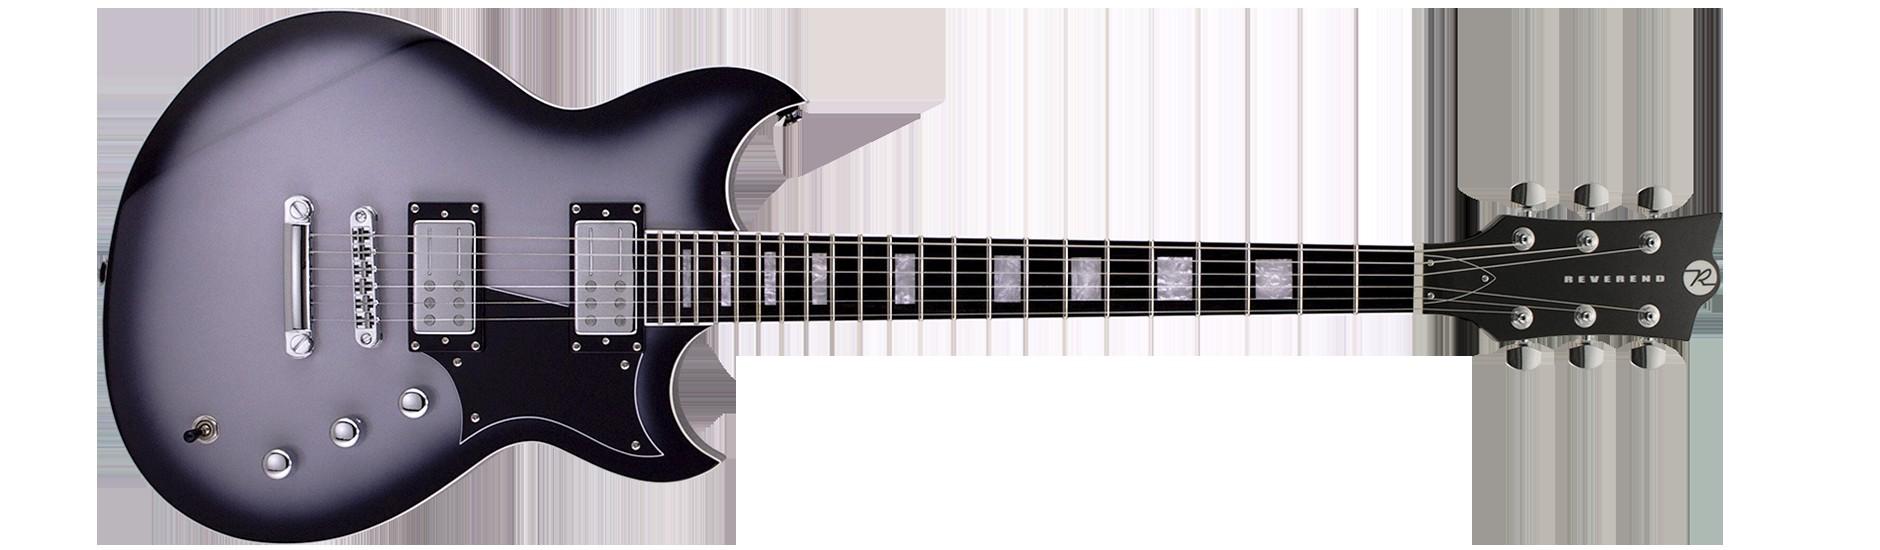 Reverend Guitar Wiring Diagram Free Download Diagrams Xwiaw